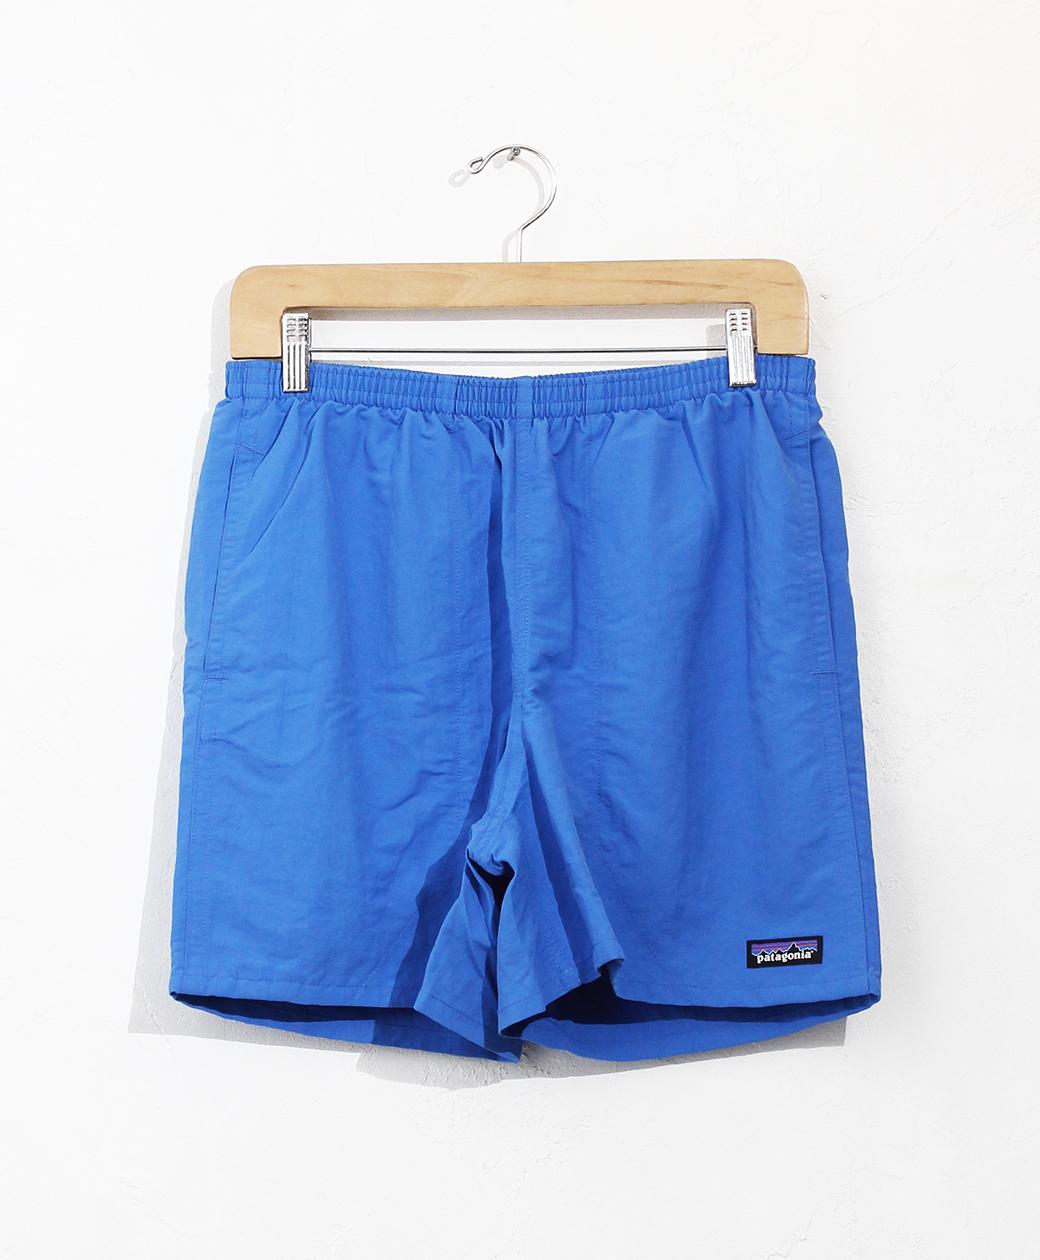 patagonia M's Baggies Shorts 5(BYBL)